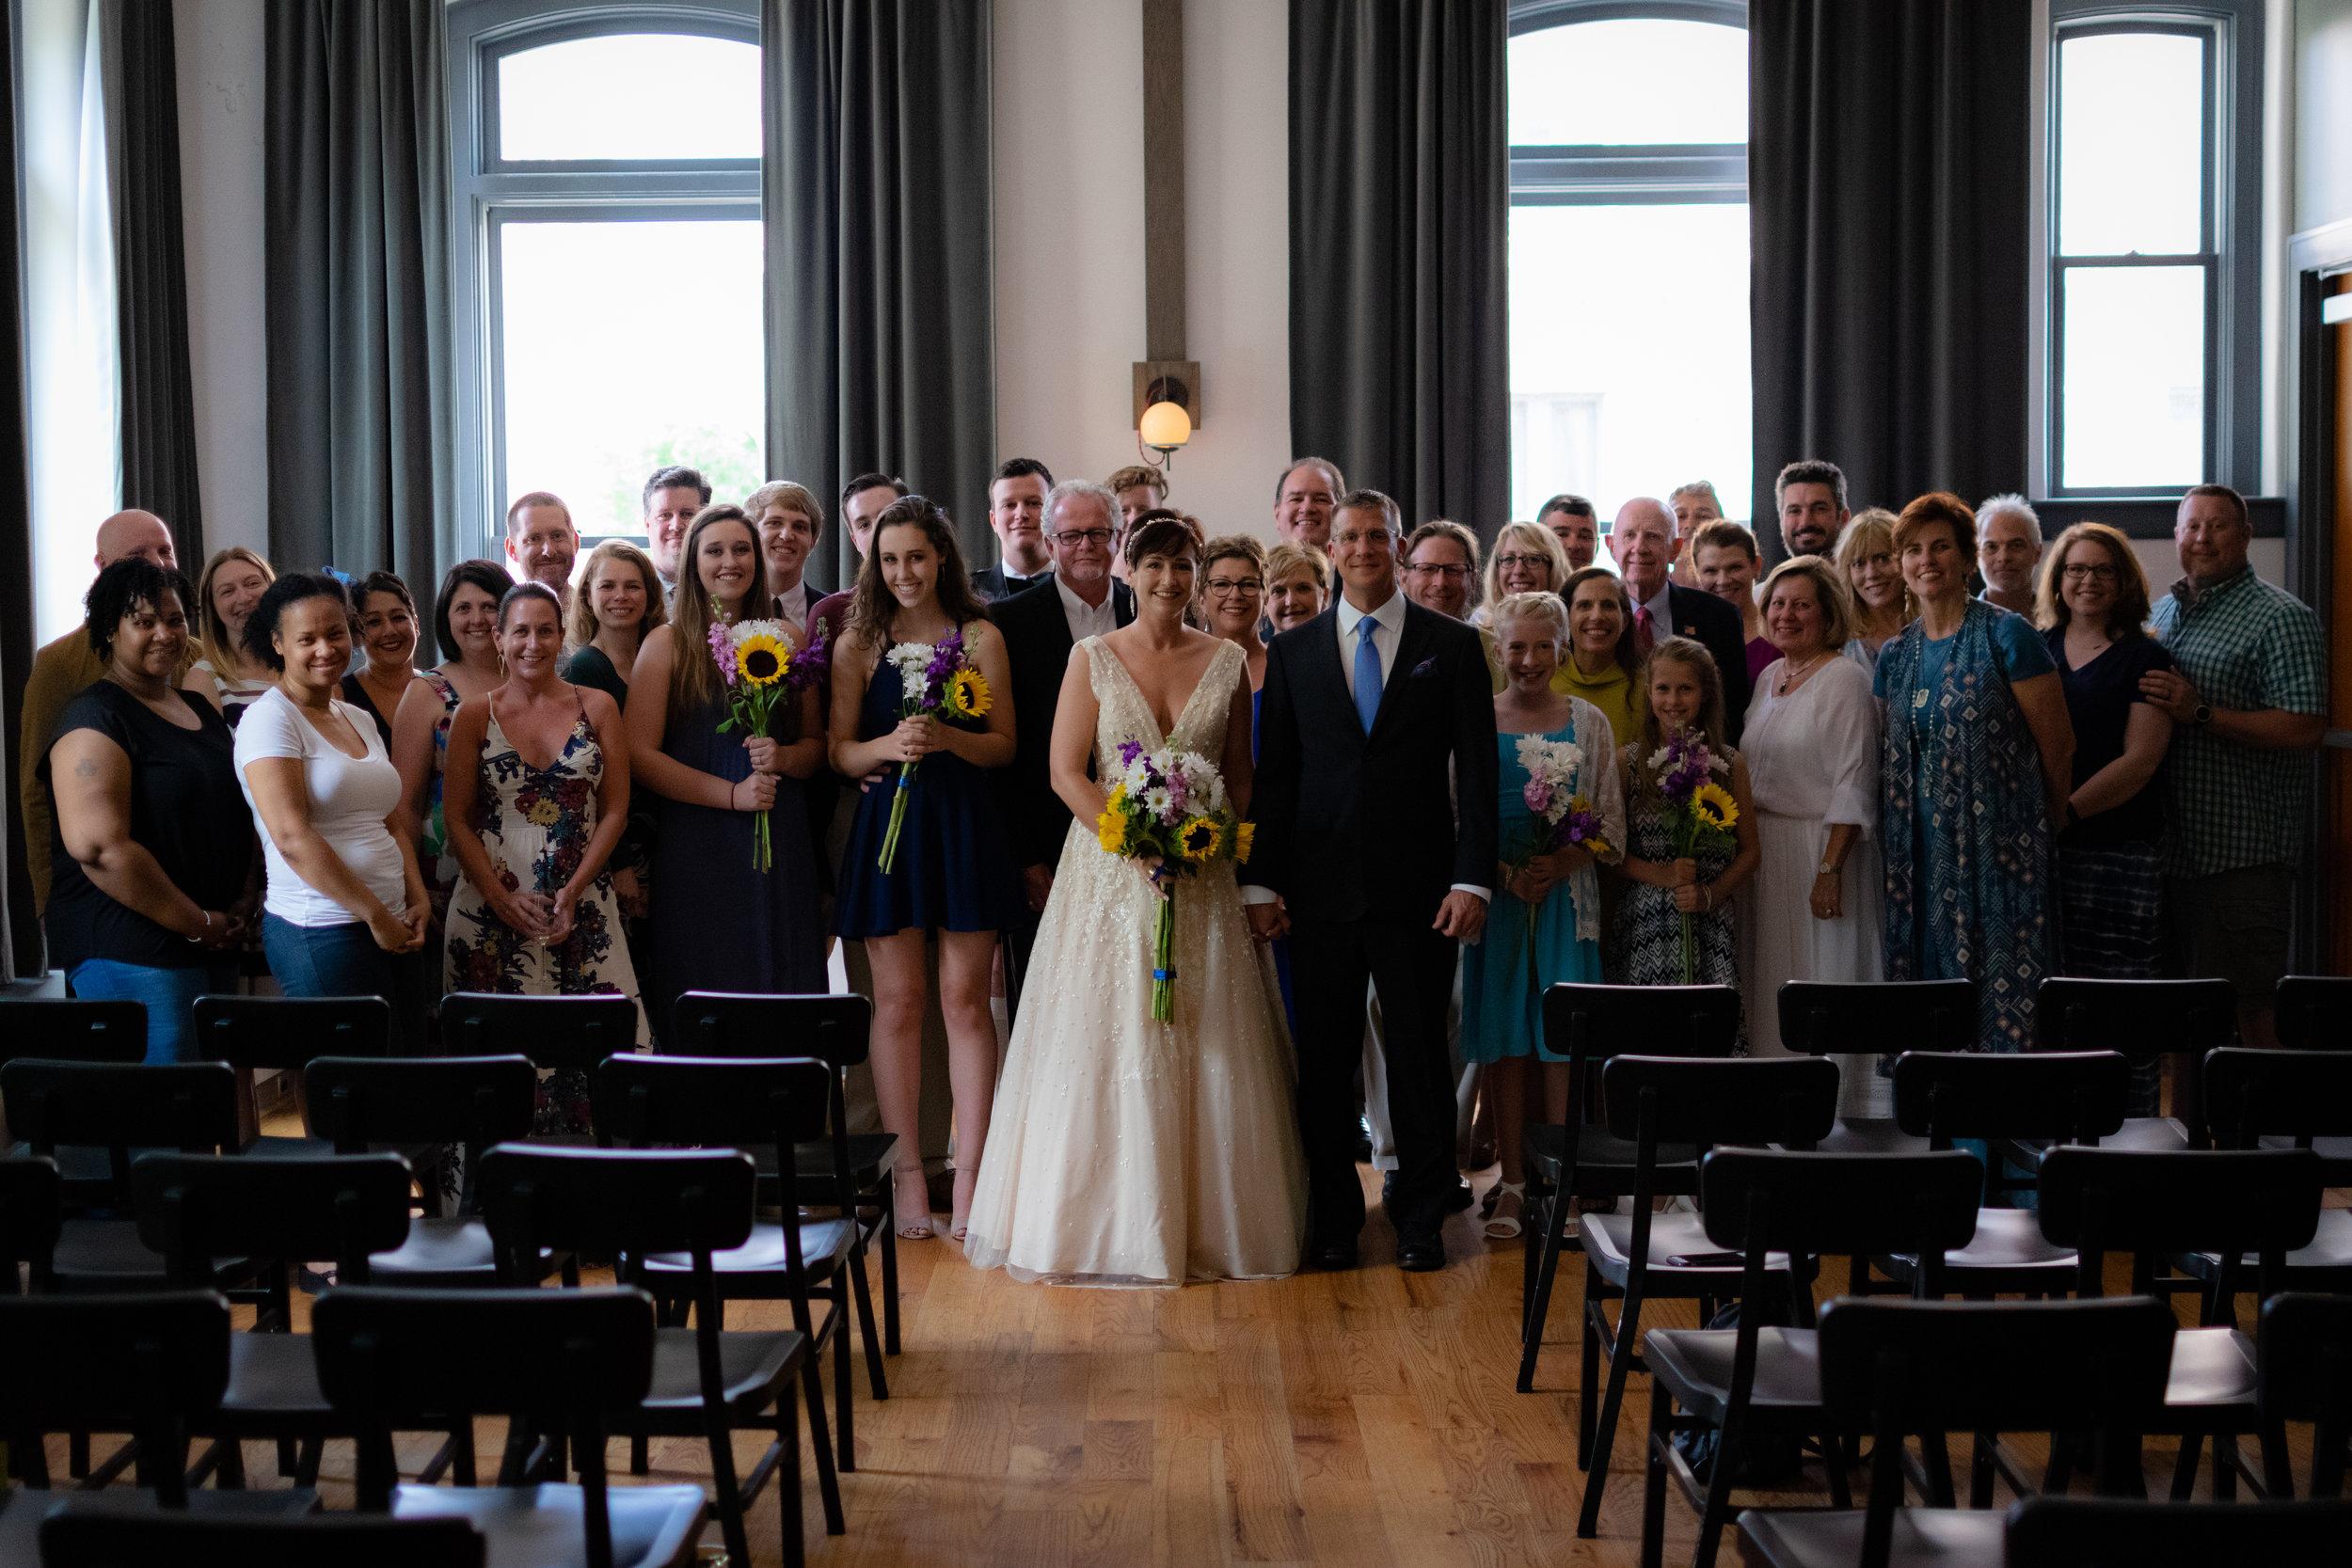 R&B_wedding_pictures-42.jpg